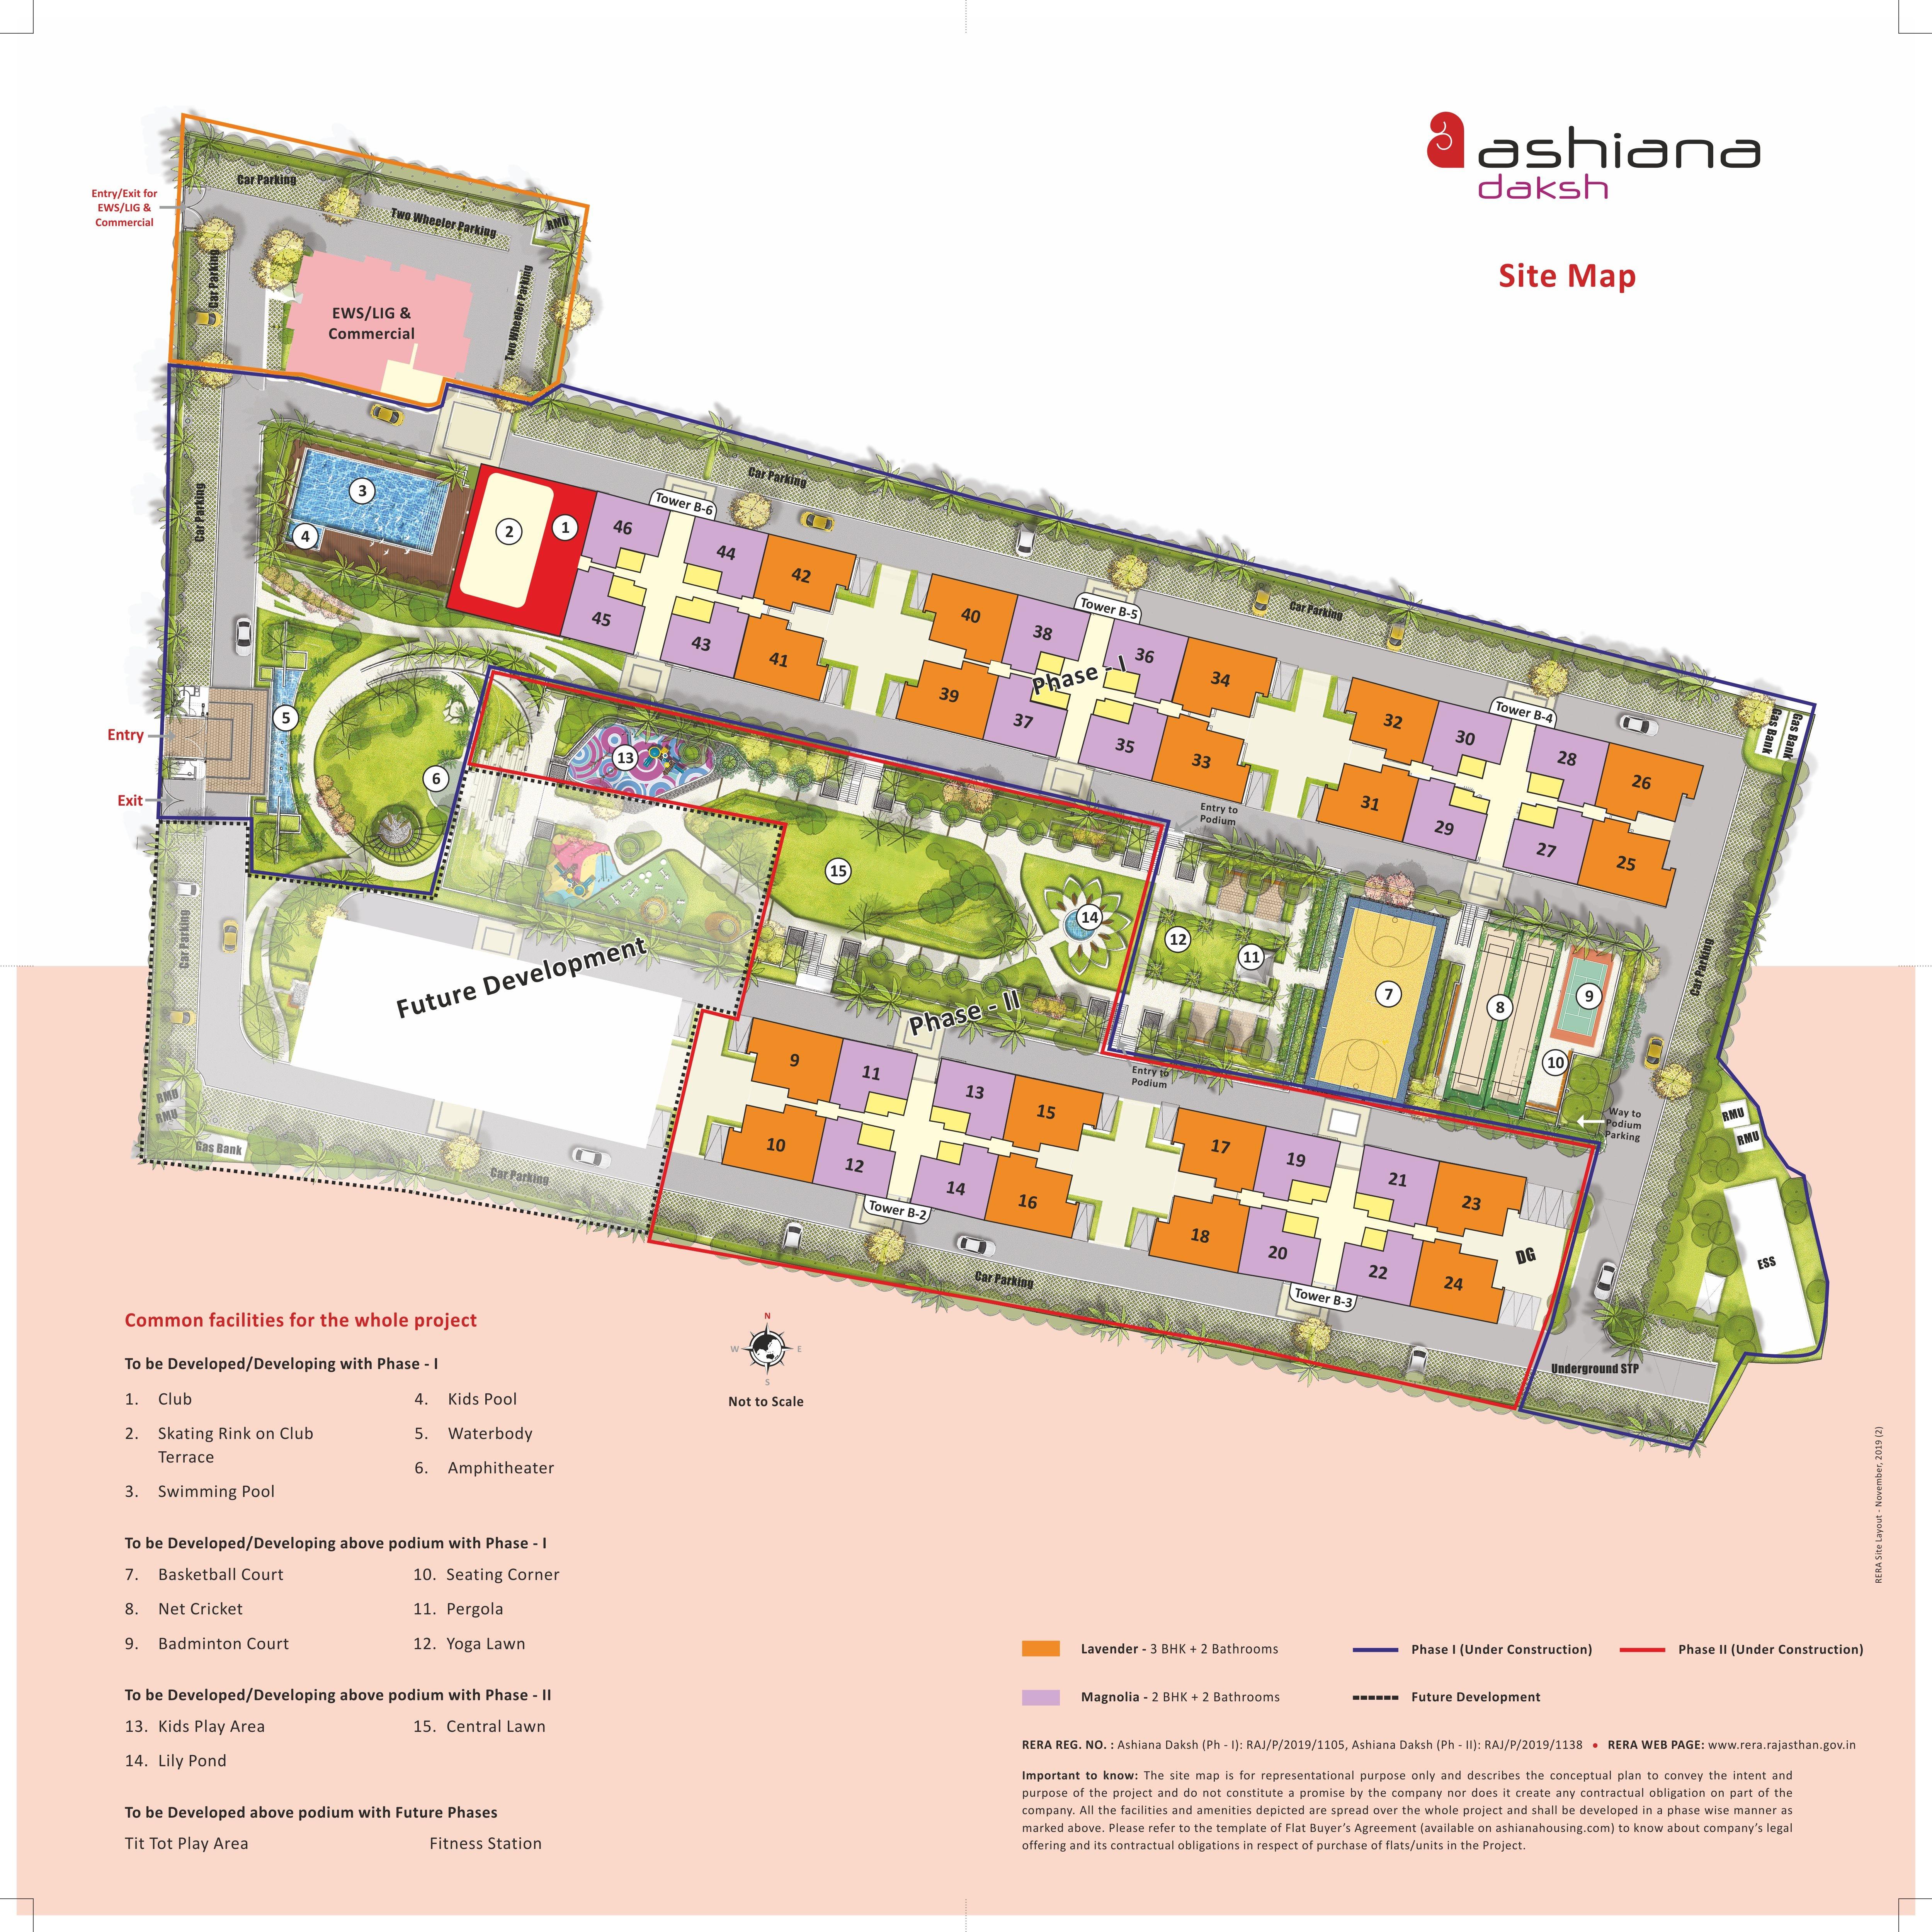 ashiana daksh phase 1 project master plan image1